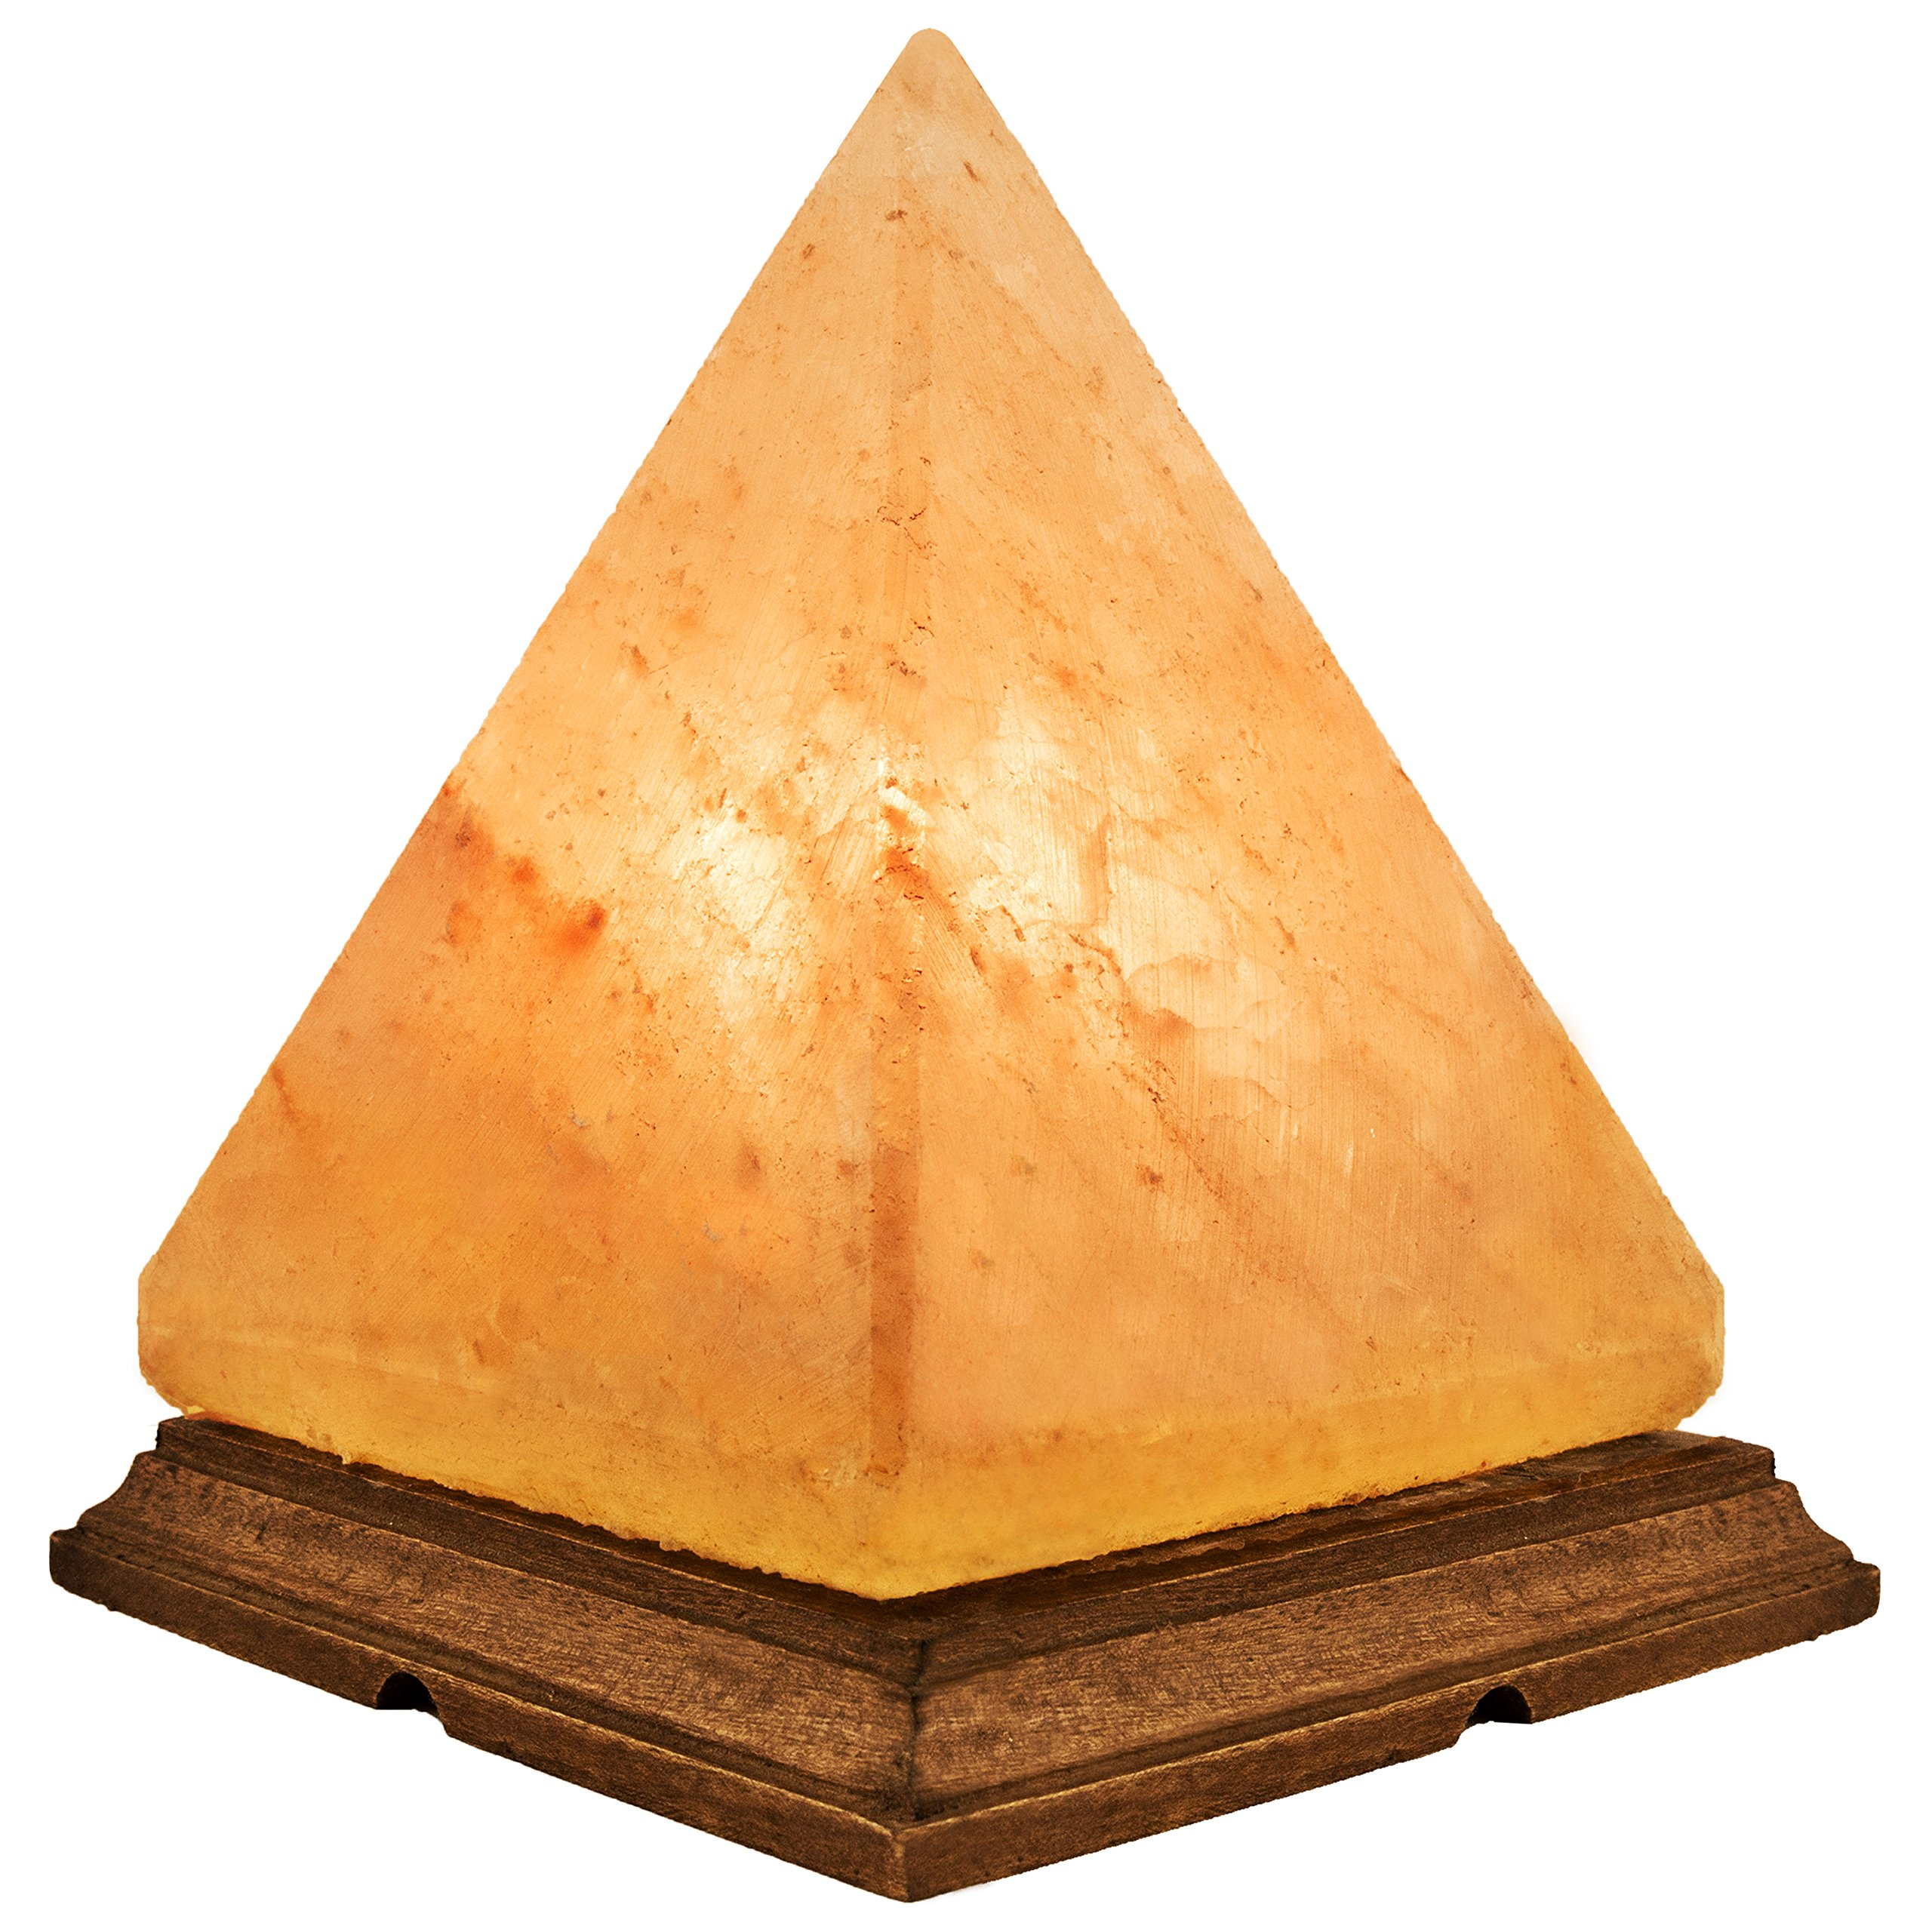 Natural Himalayan Salt Lamp with Bulb, Dimmer Cord